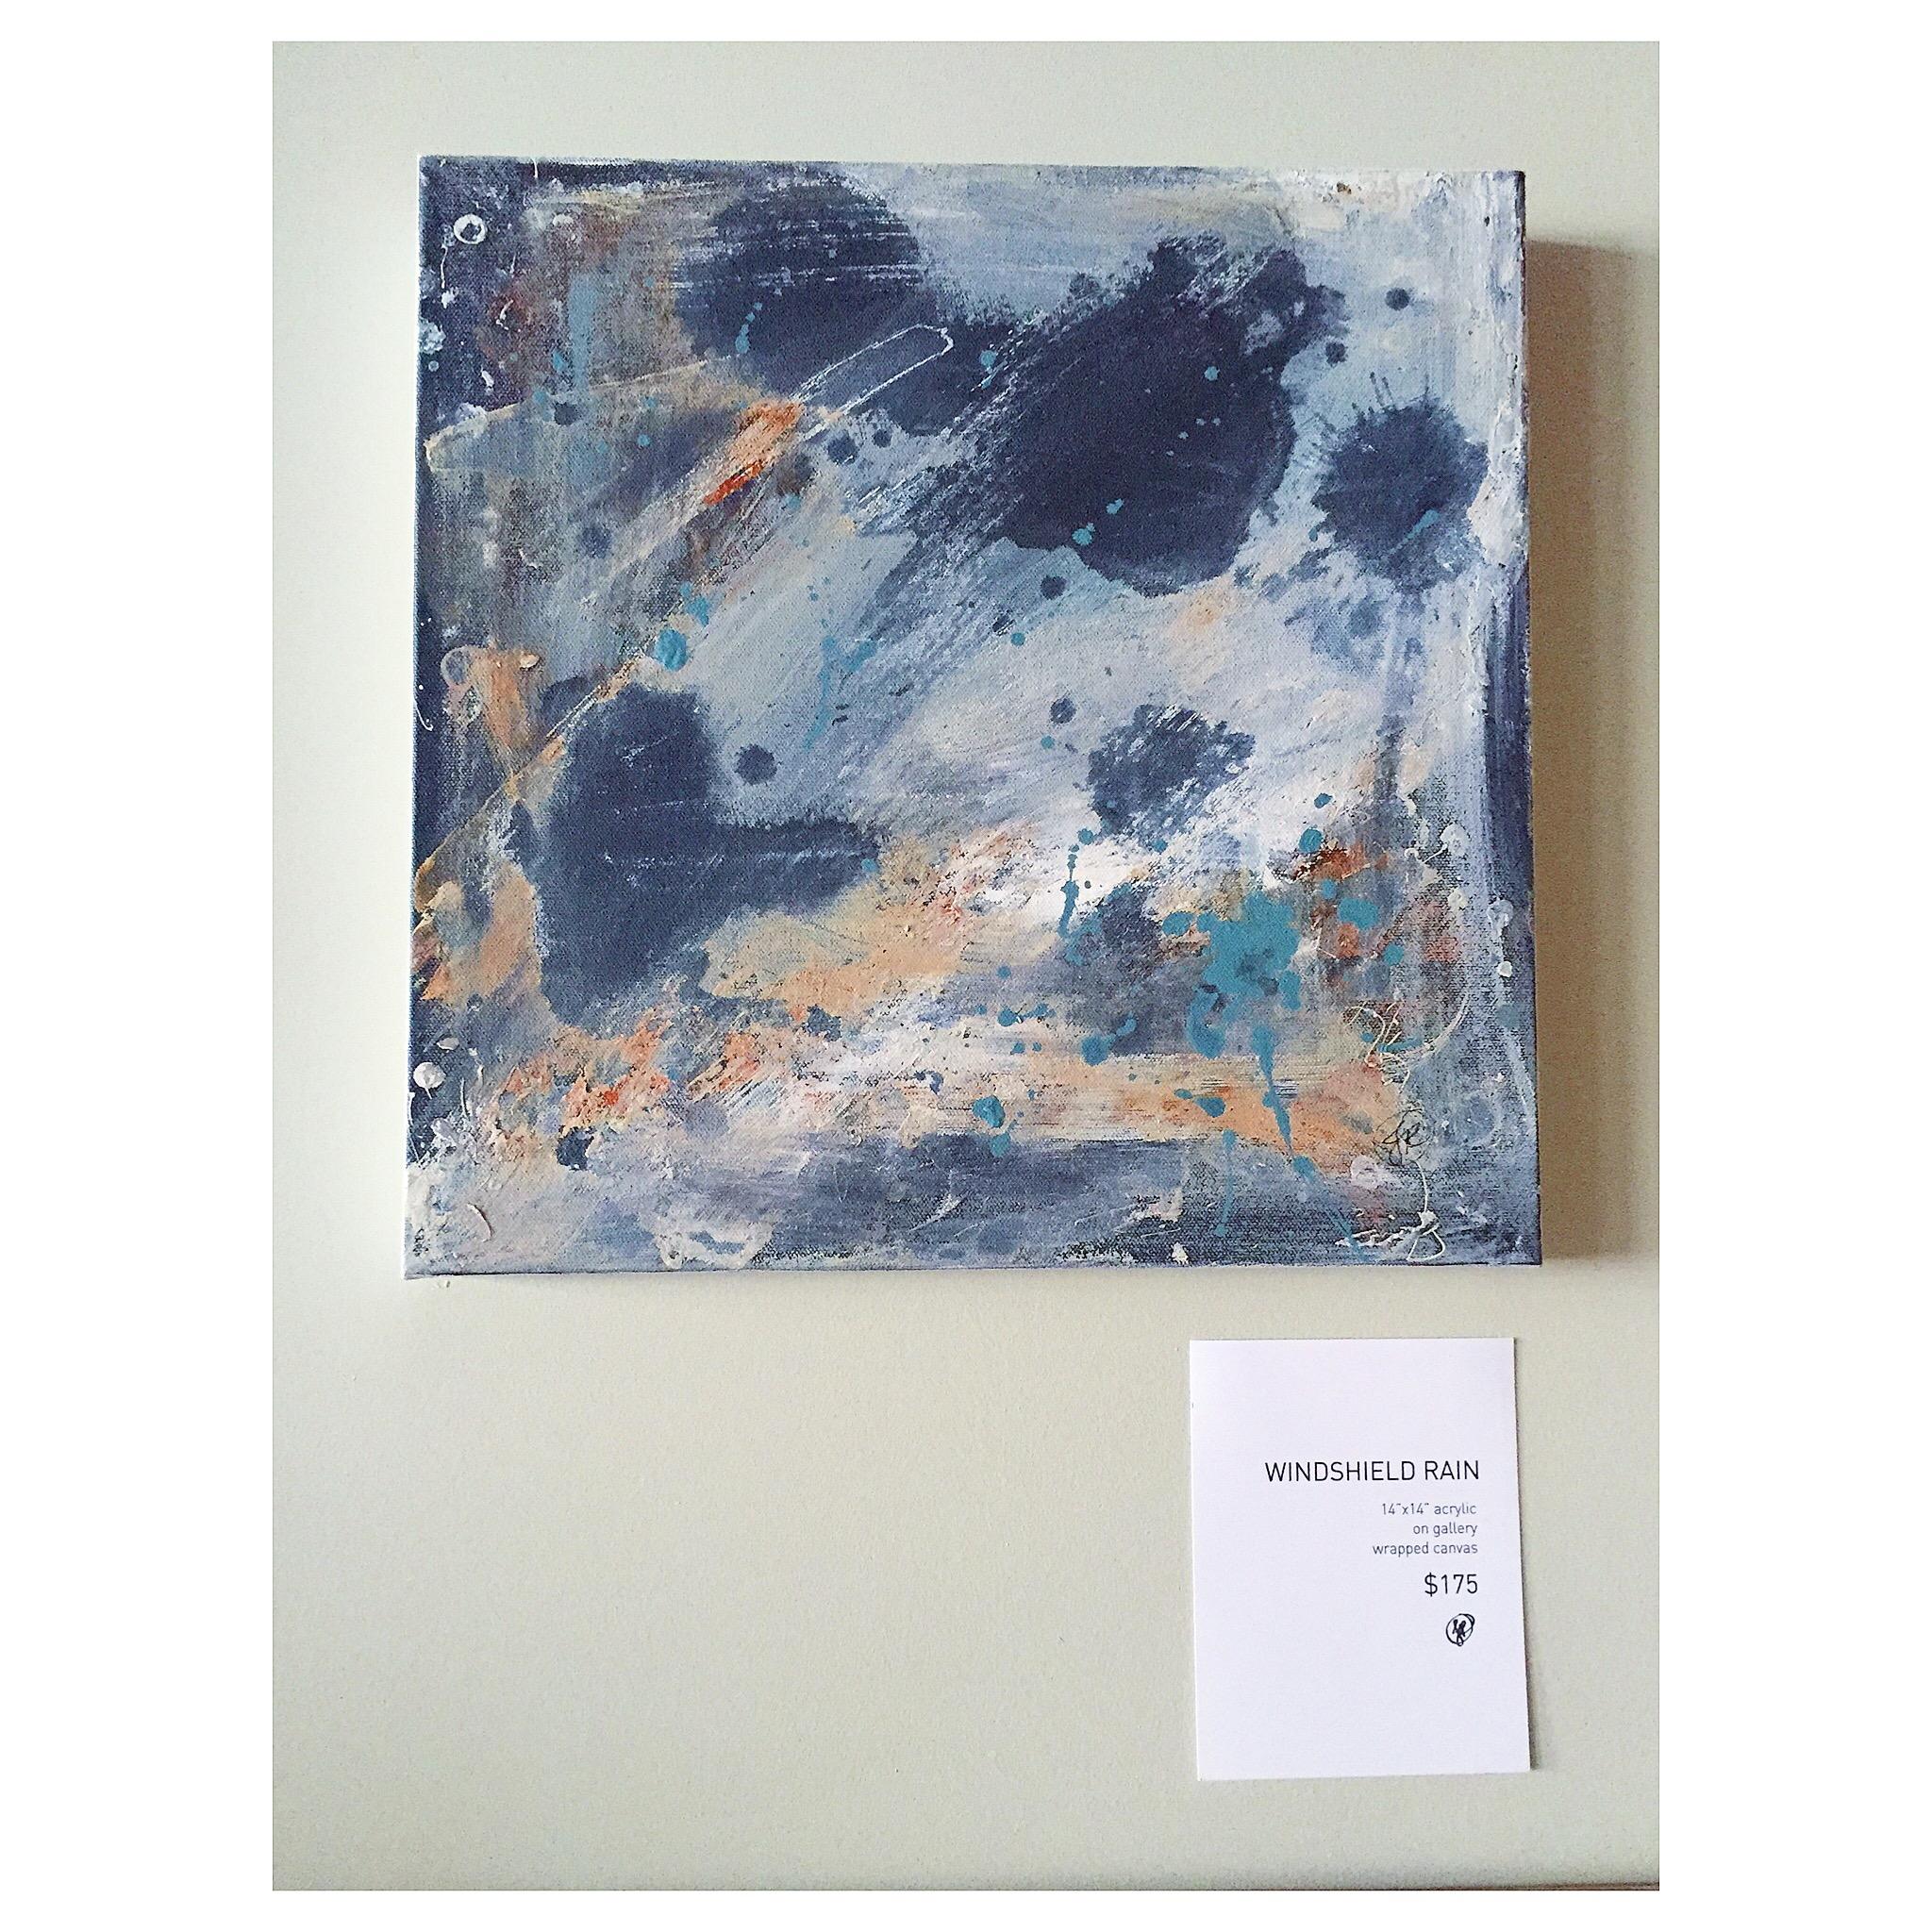 WINDSHIELD RAIN acrylic on canvas